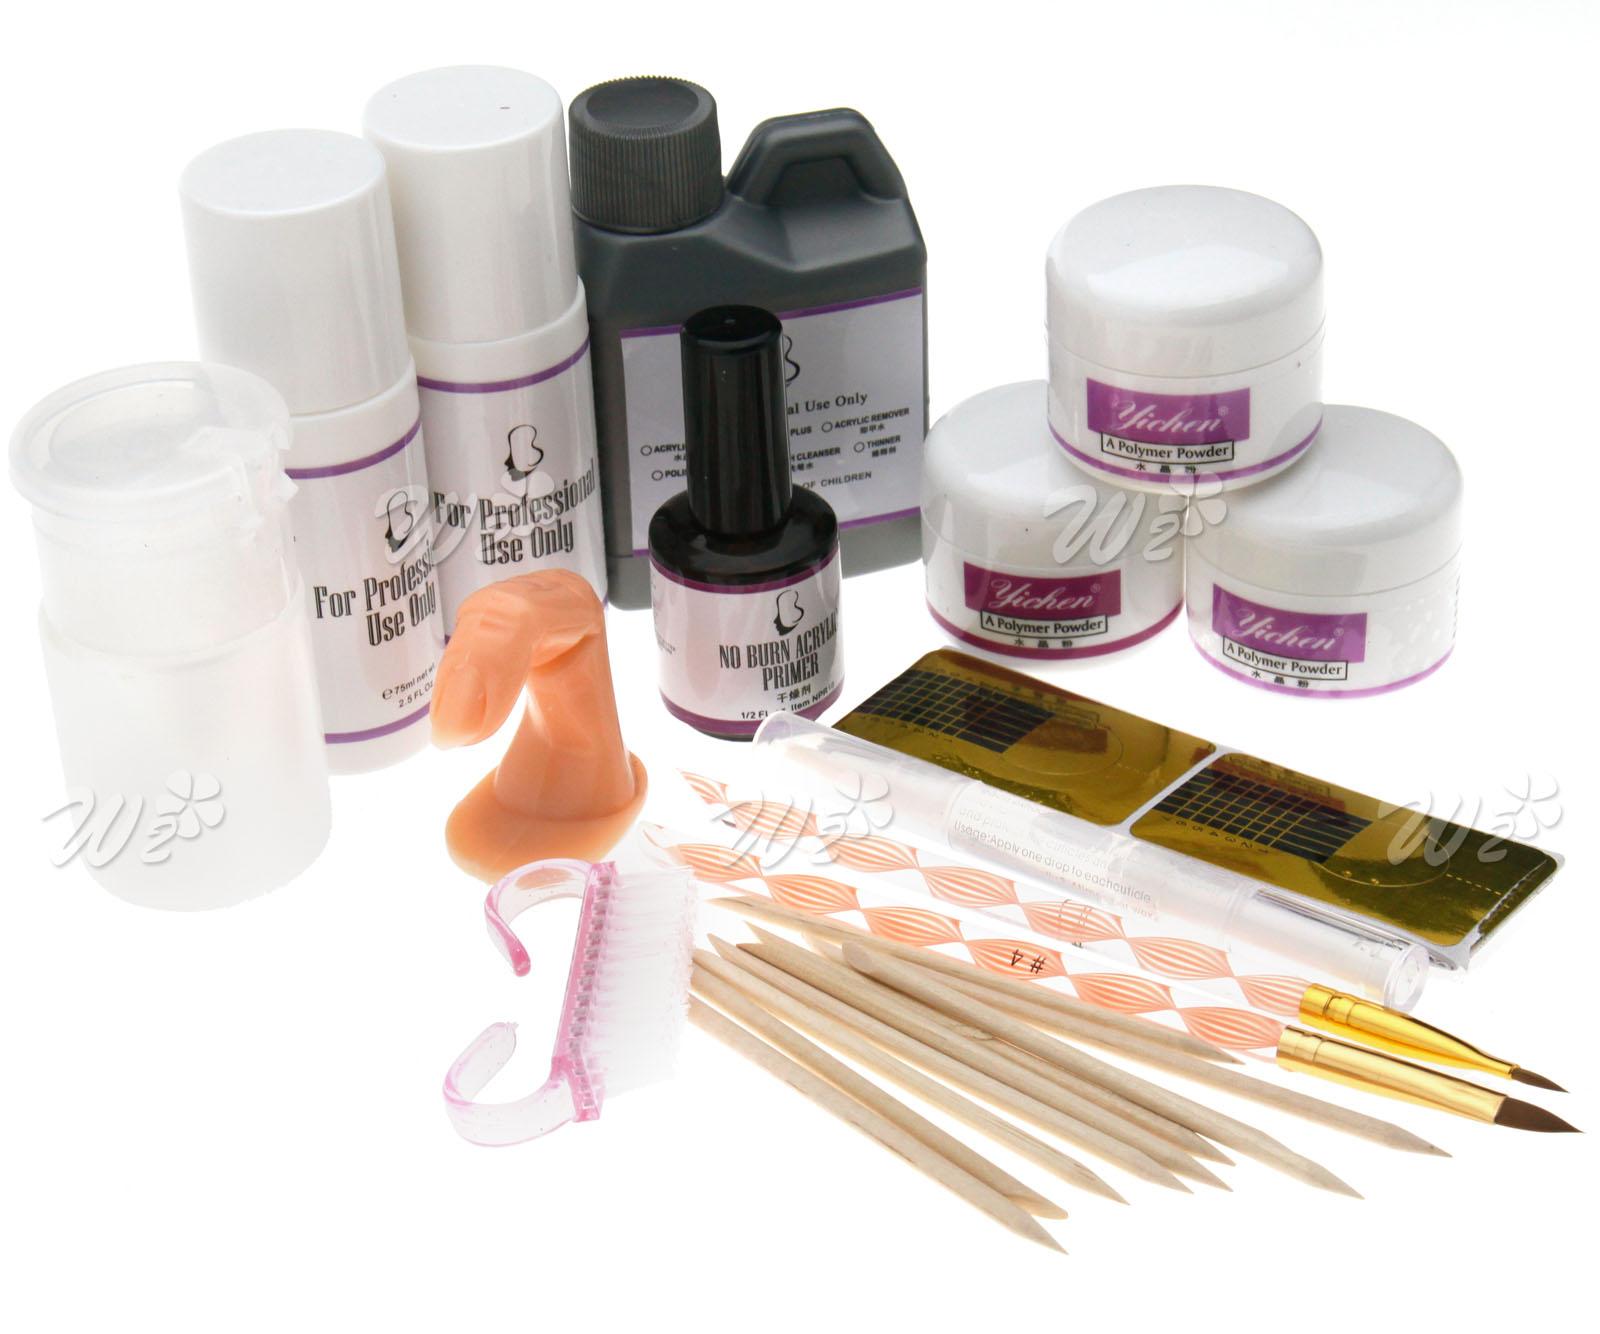 New Acrylic Nail Art Powder Liquid Rhinestone Practice